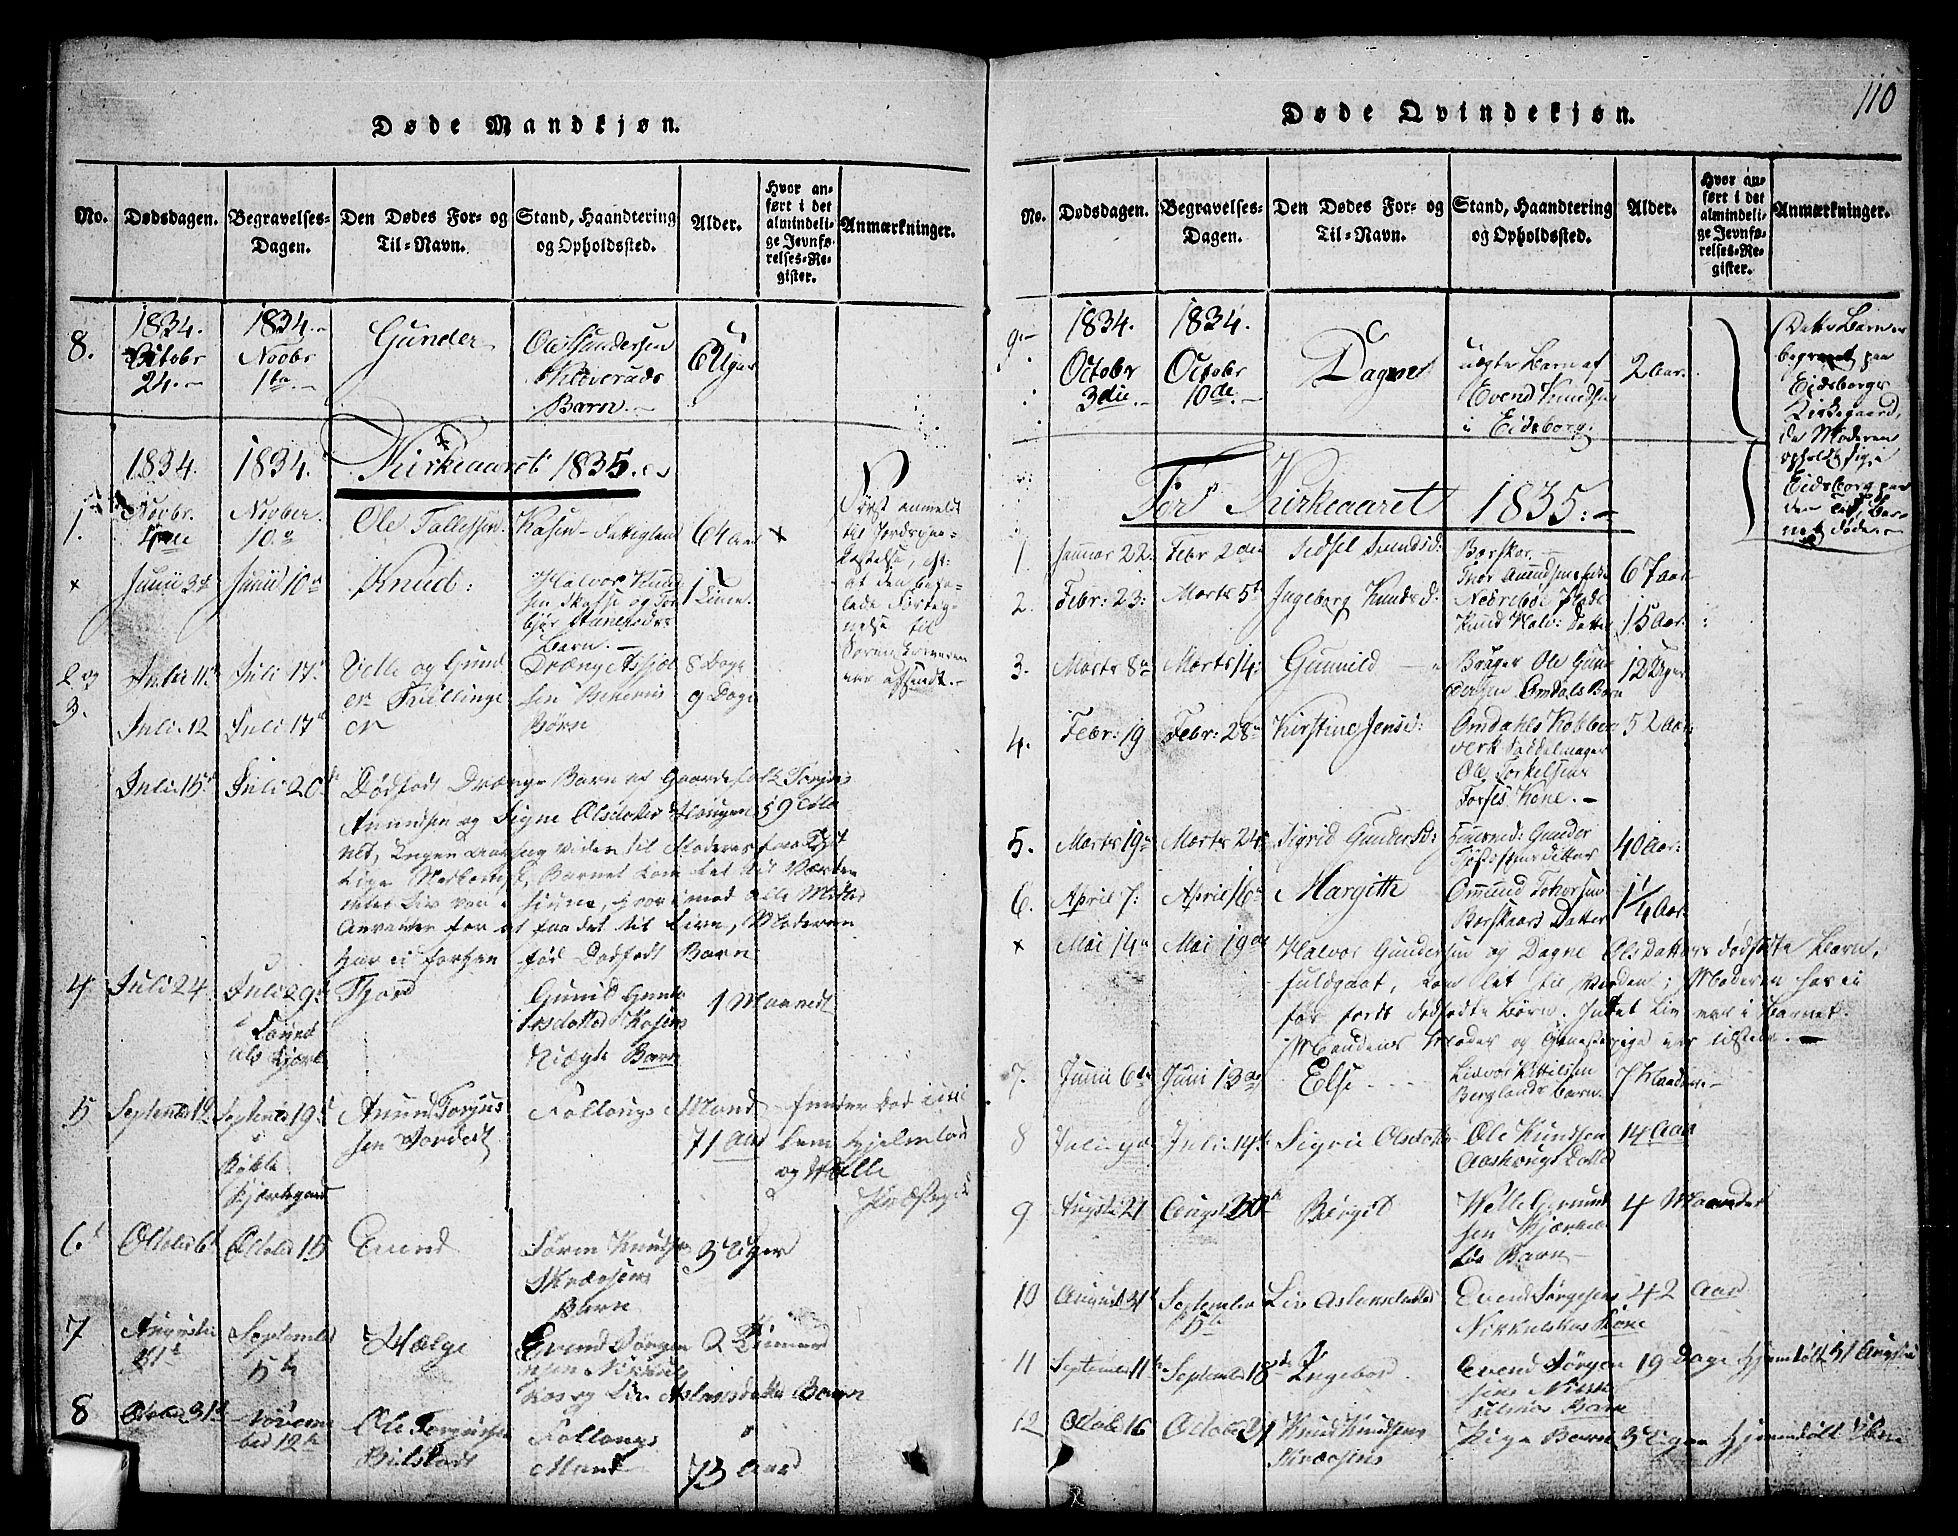 SAKO, Mo kirkebøker, G/Gb/L0001: Klokkerbok nr. II 1, 1814-1843, s. 110